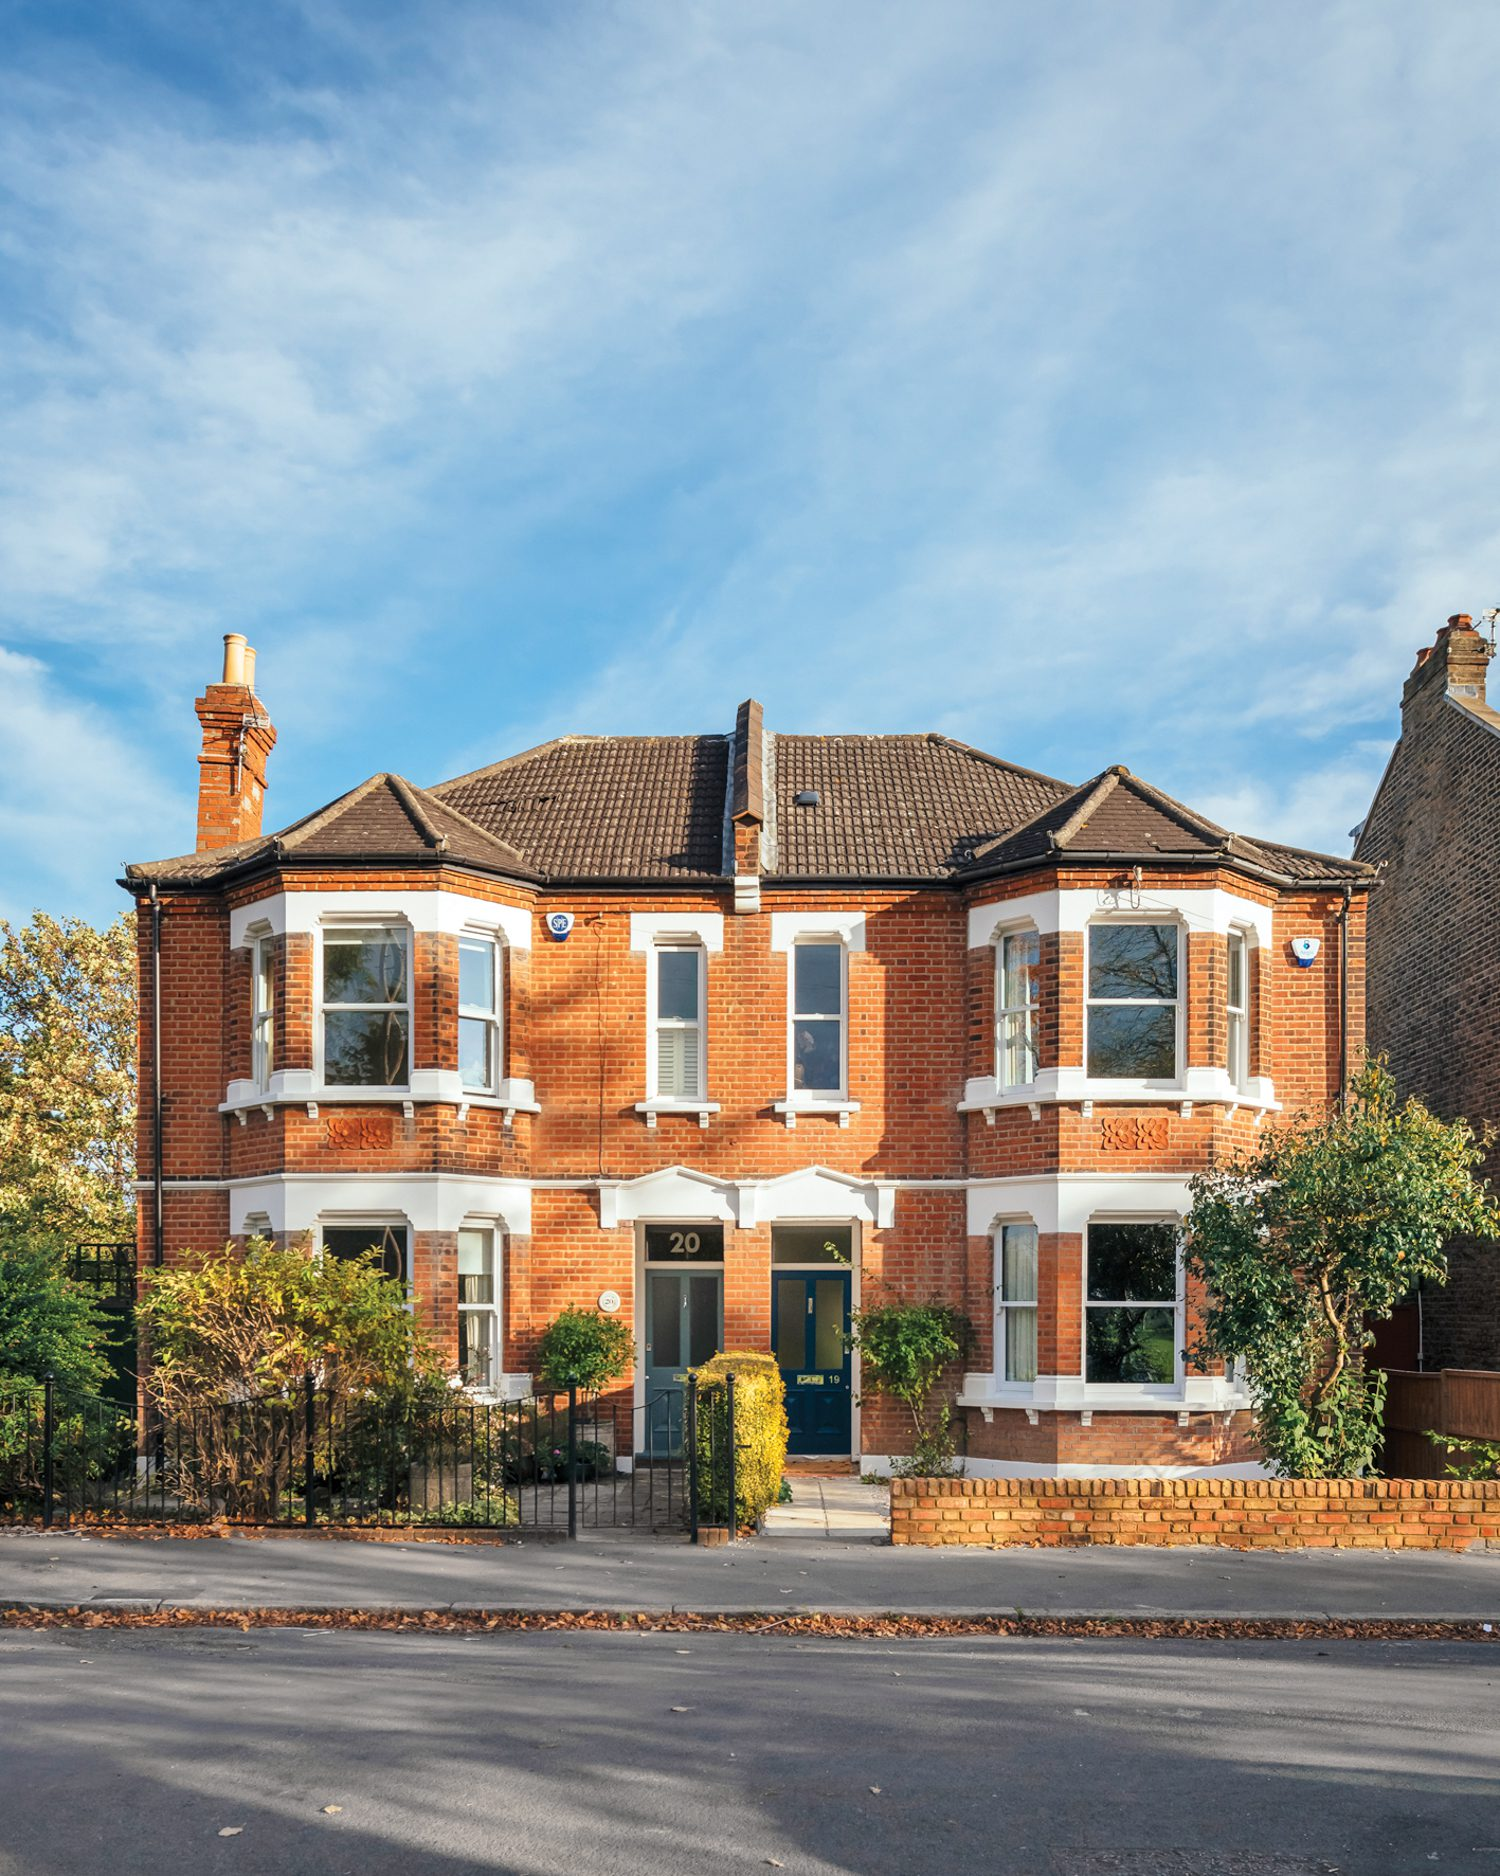 The semidetached brick house, located in London's Sydenham neighborhood, dates to the Edwardian era.